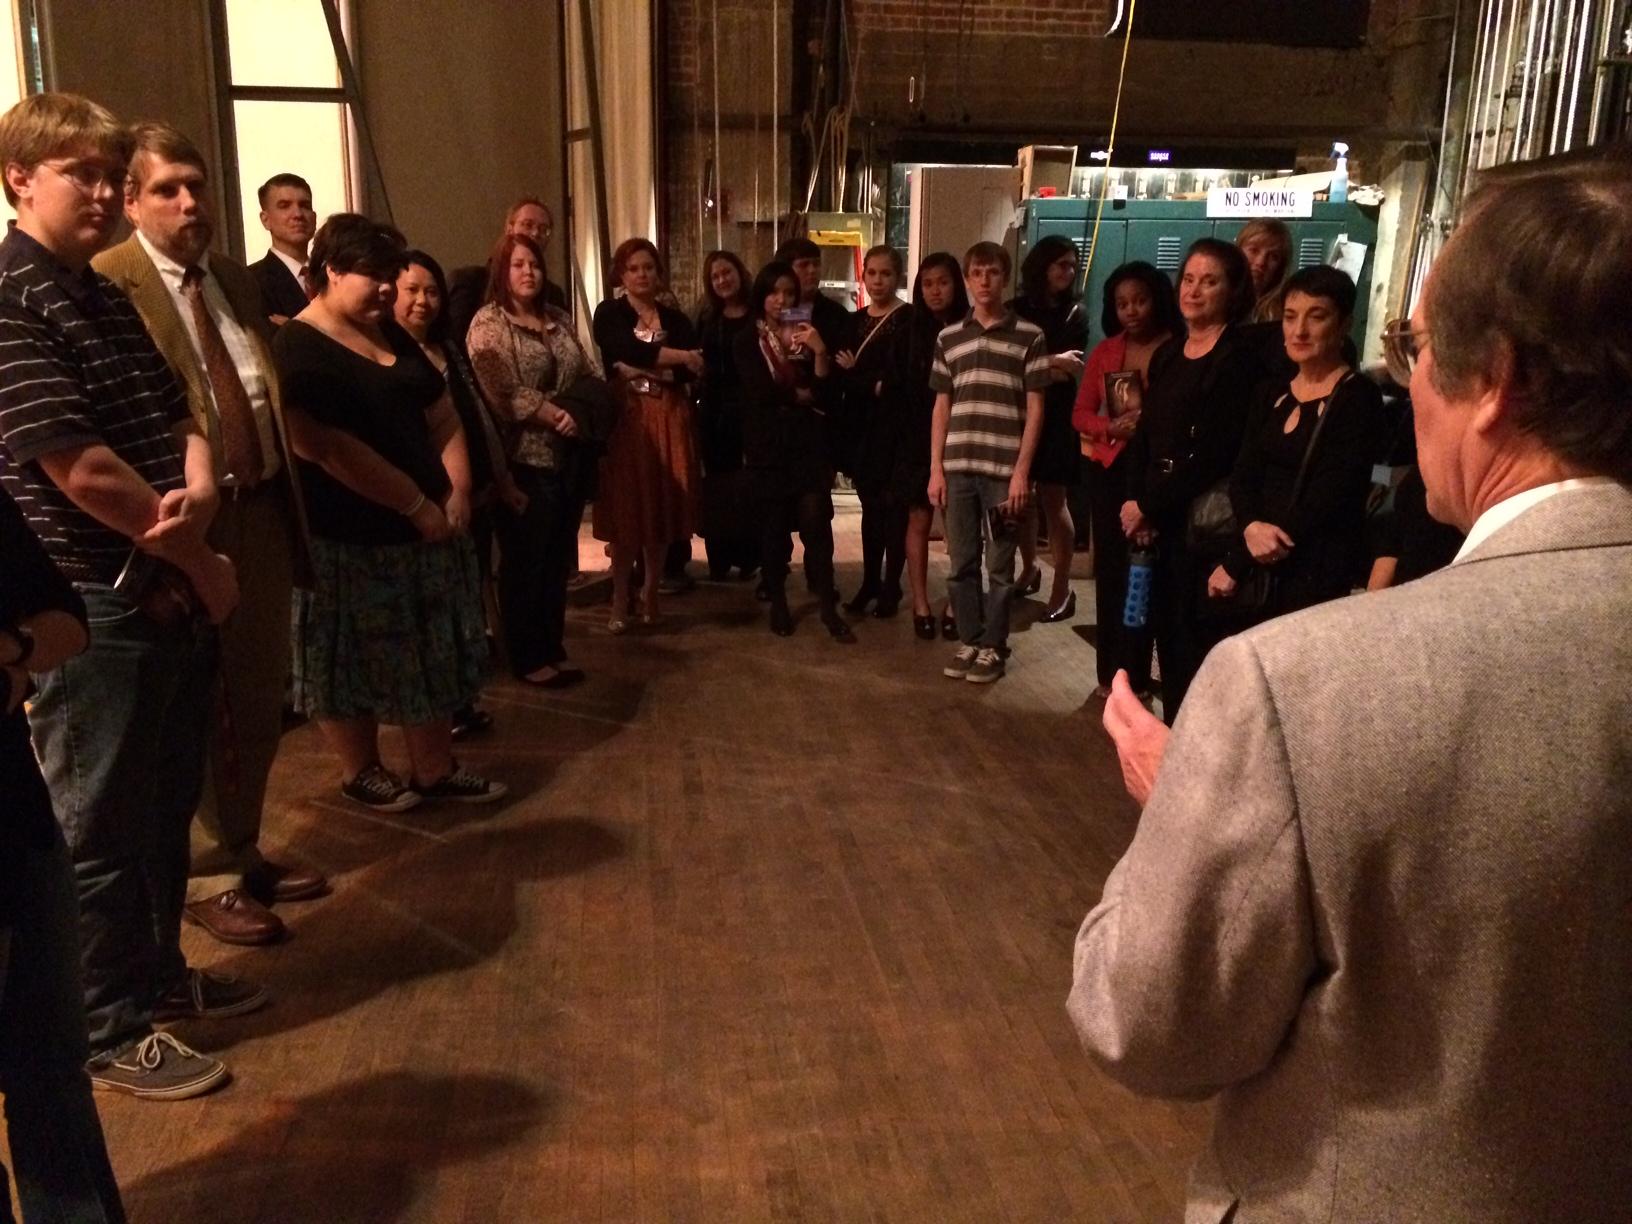 Arts and Literature members get behind-the-scenes look at poetry, music